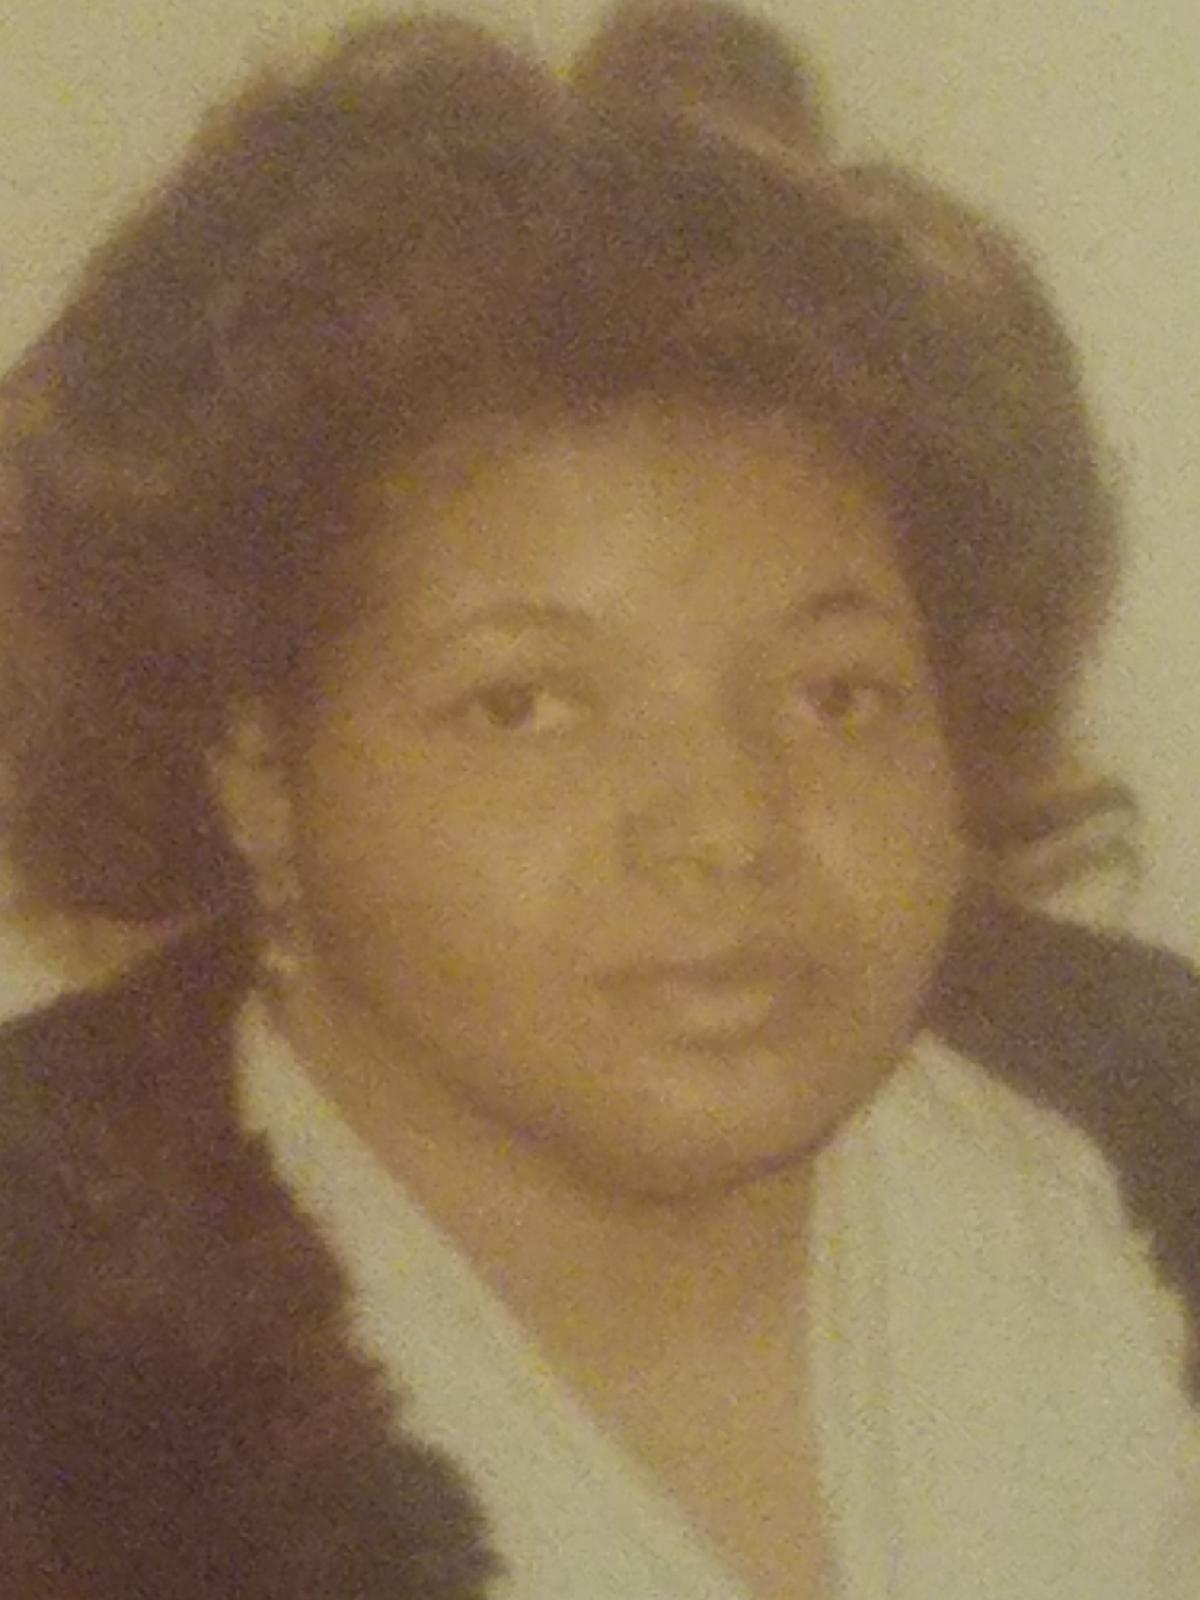 Dr. Jacqueline  Banks: Dr. Jacqueline Banks